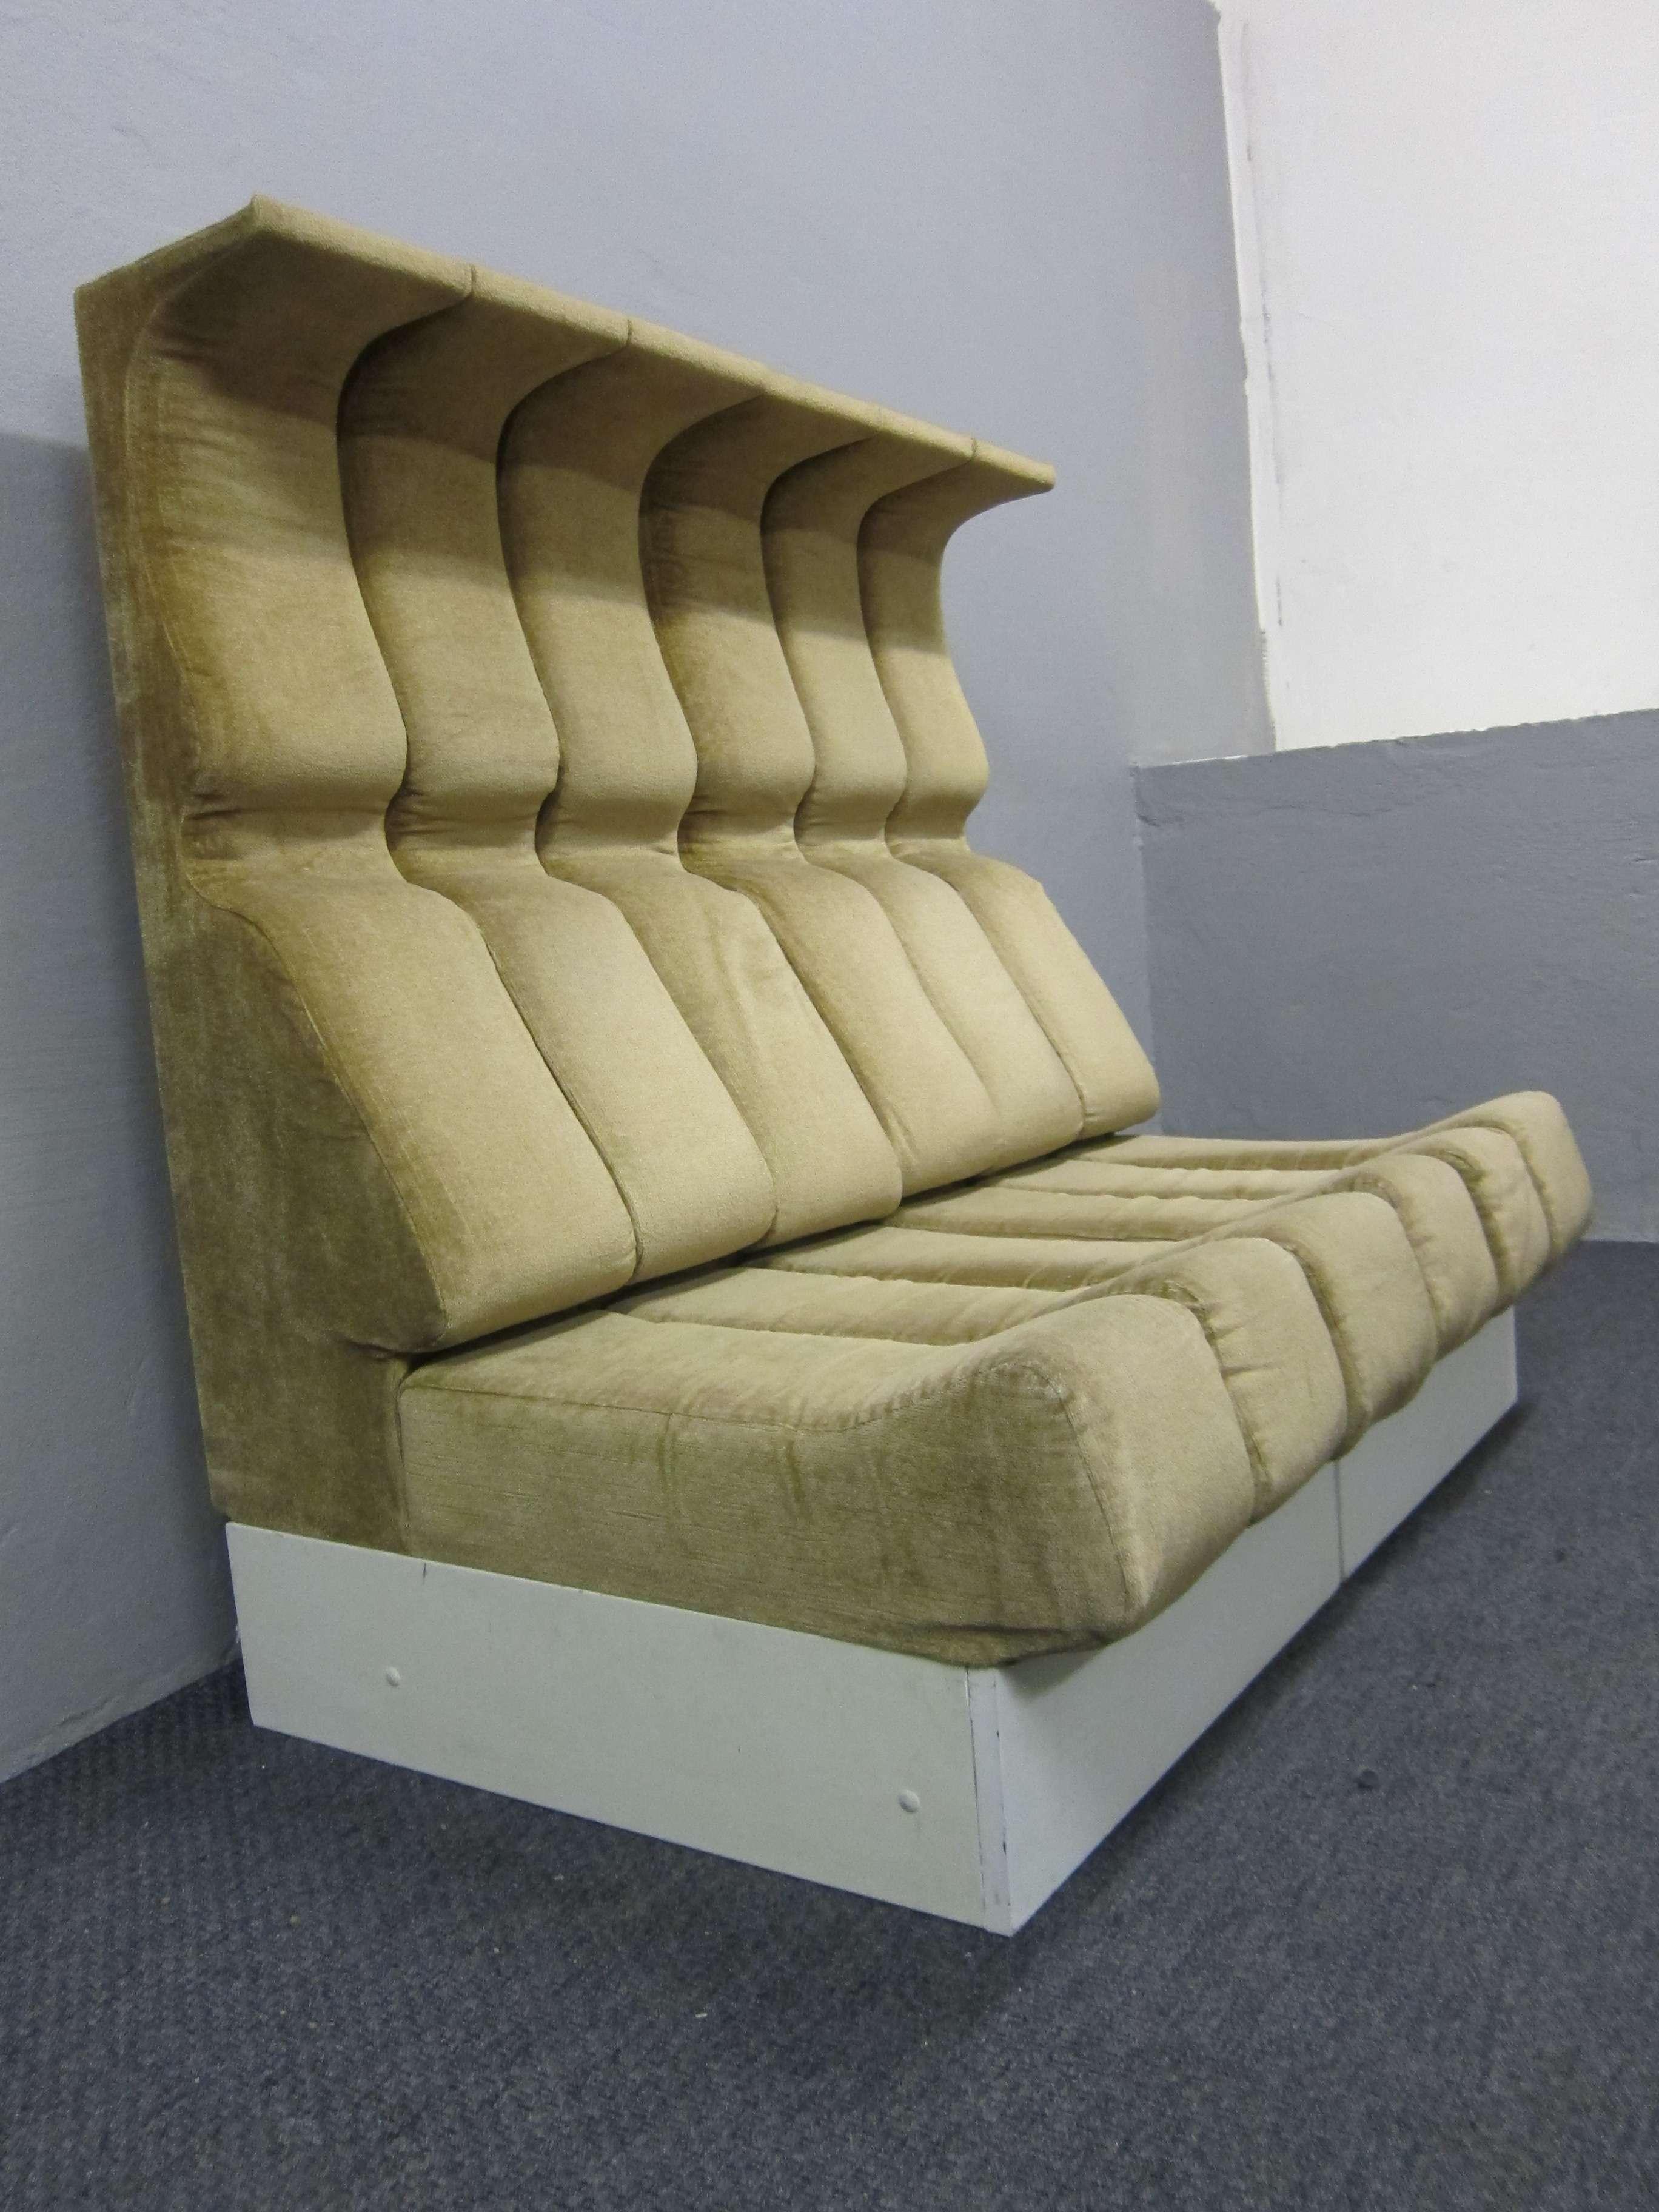 2 sitzelemente sessel sofa interl bke umgebung 121 design for Sessel 60er design